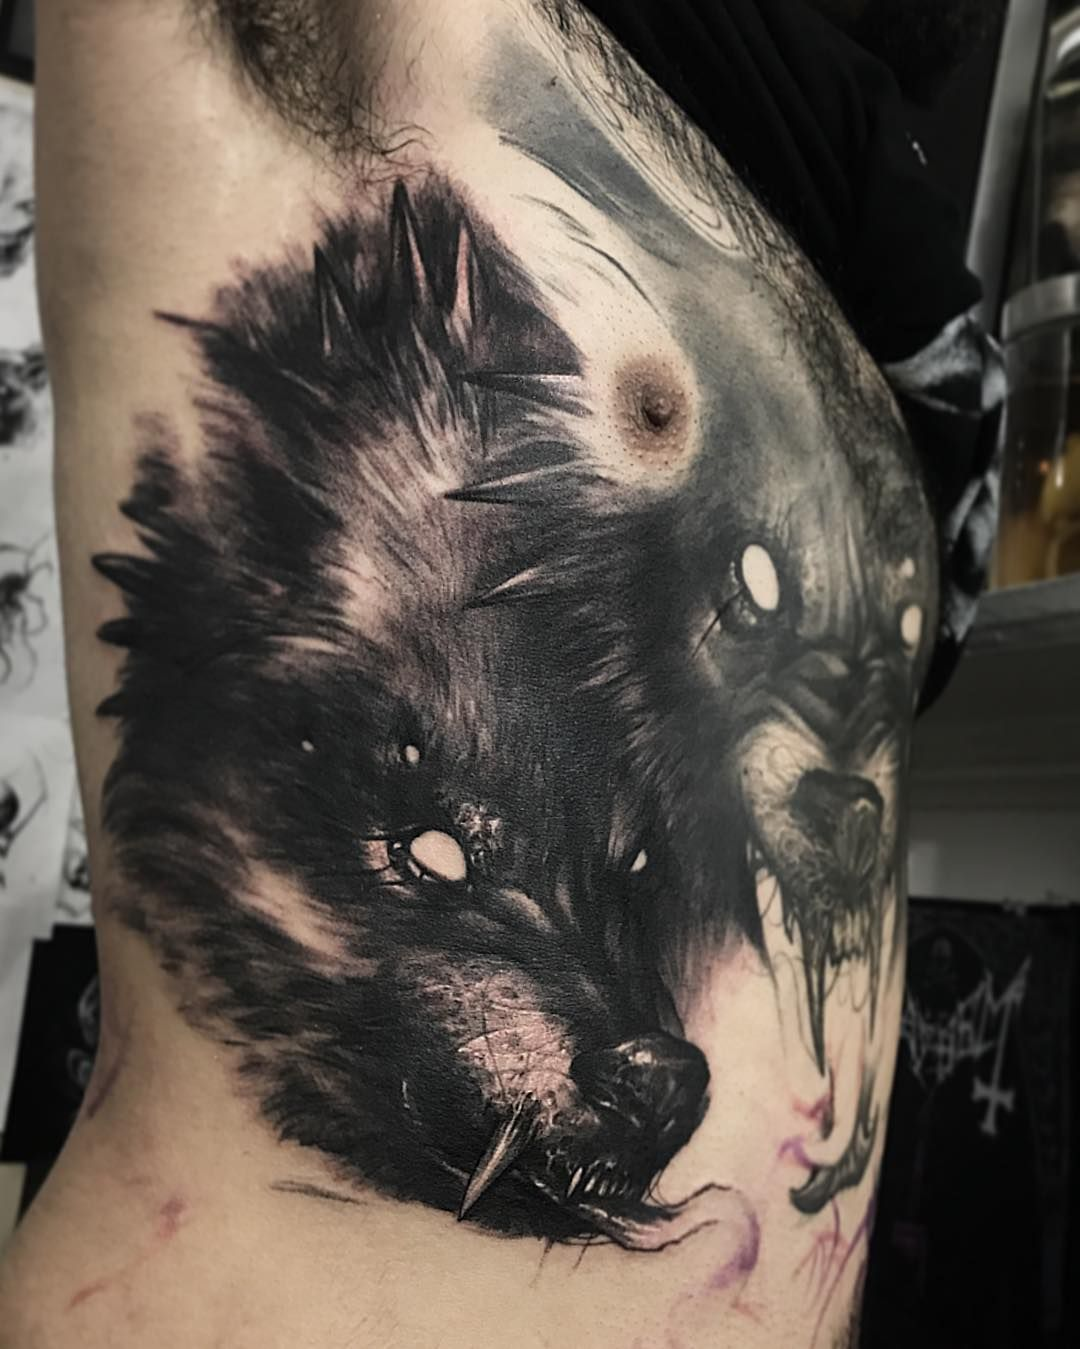 3rd Wolf Head On This Cerberus On Tattoosbychico714 Inprogress Cerberus Evil Wolf Tattoo Worldfamousink Bal Hand Tattoos Tattoos Head Tattoos